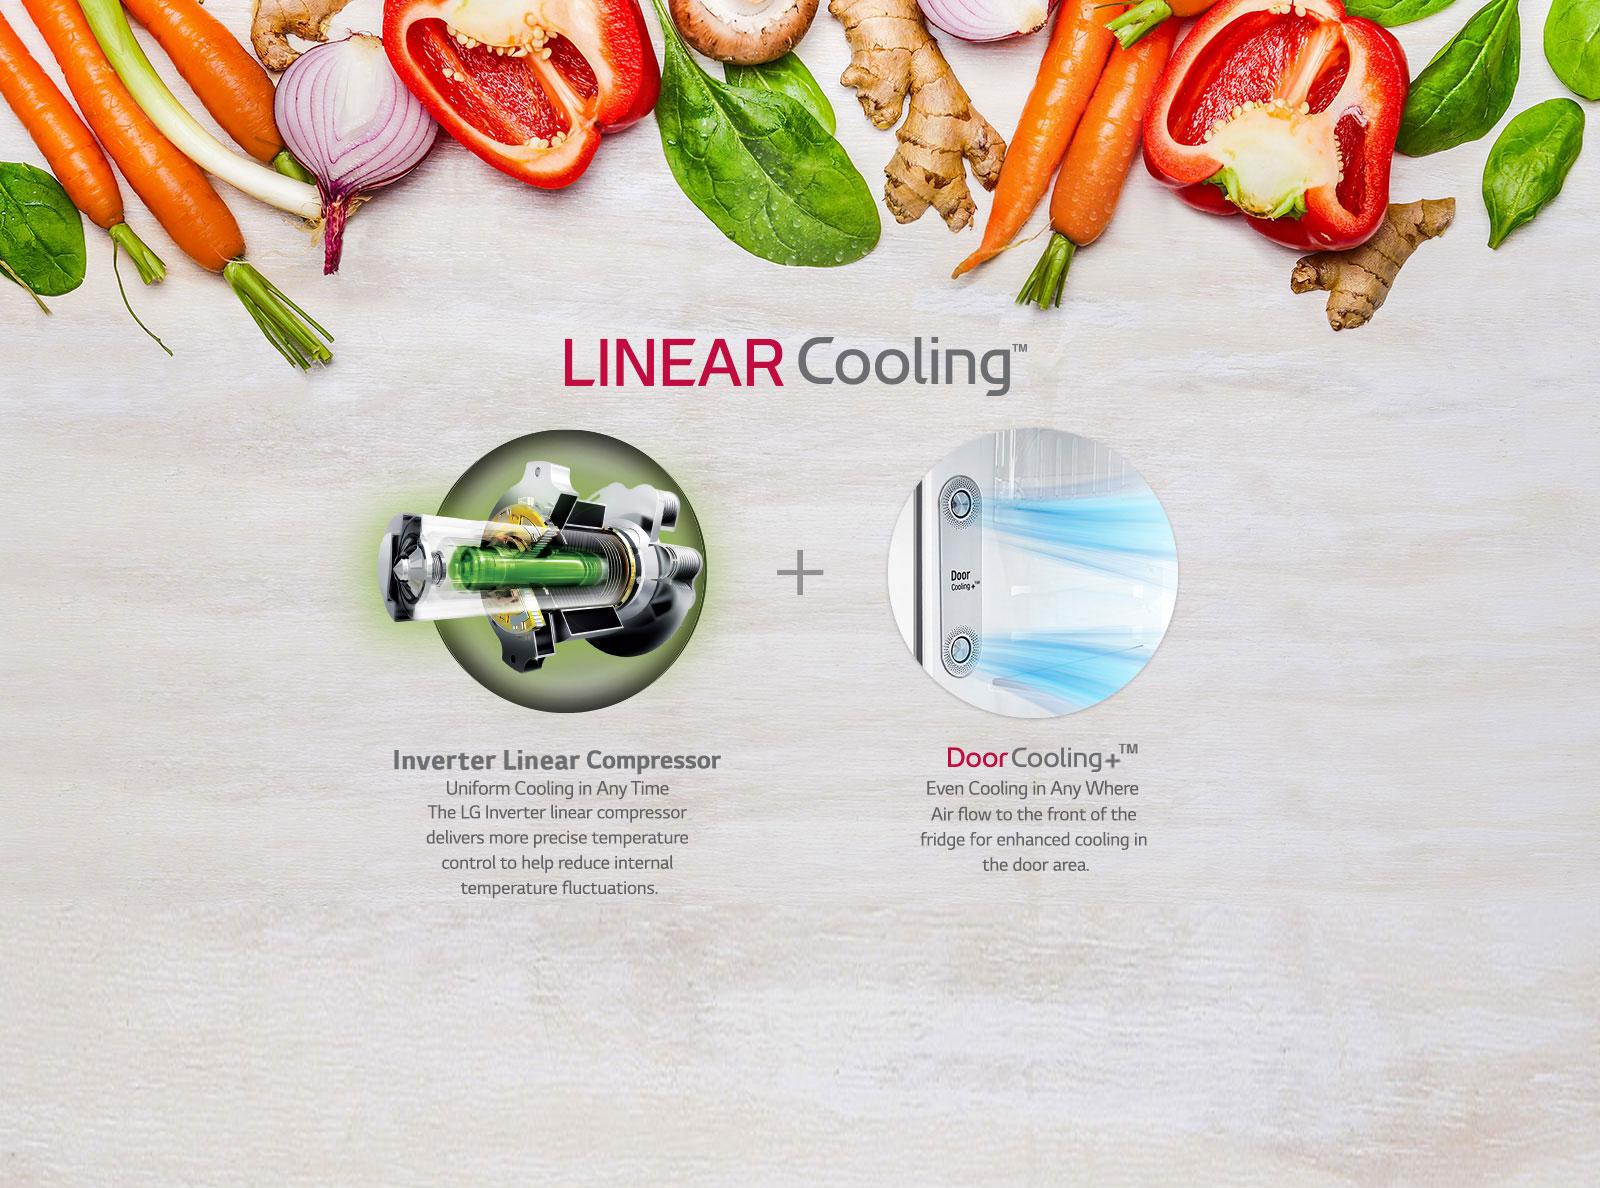 LG GL-T432FPZ3 437 Ltr Linear Cooling